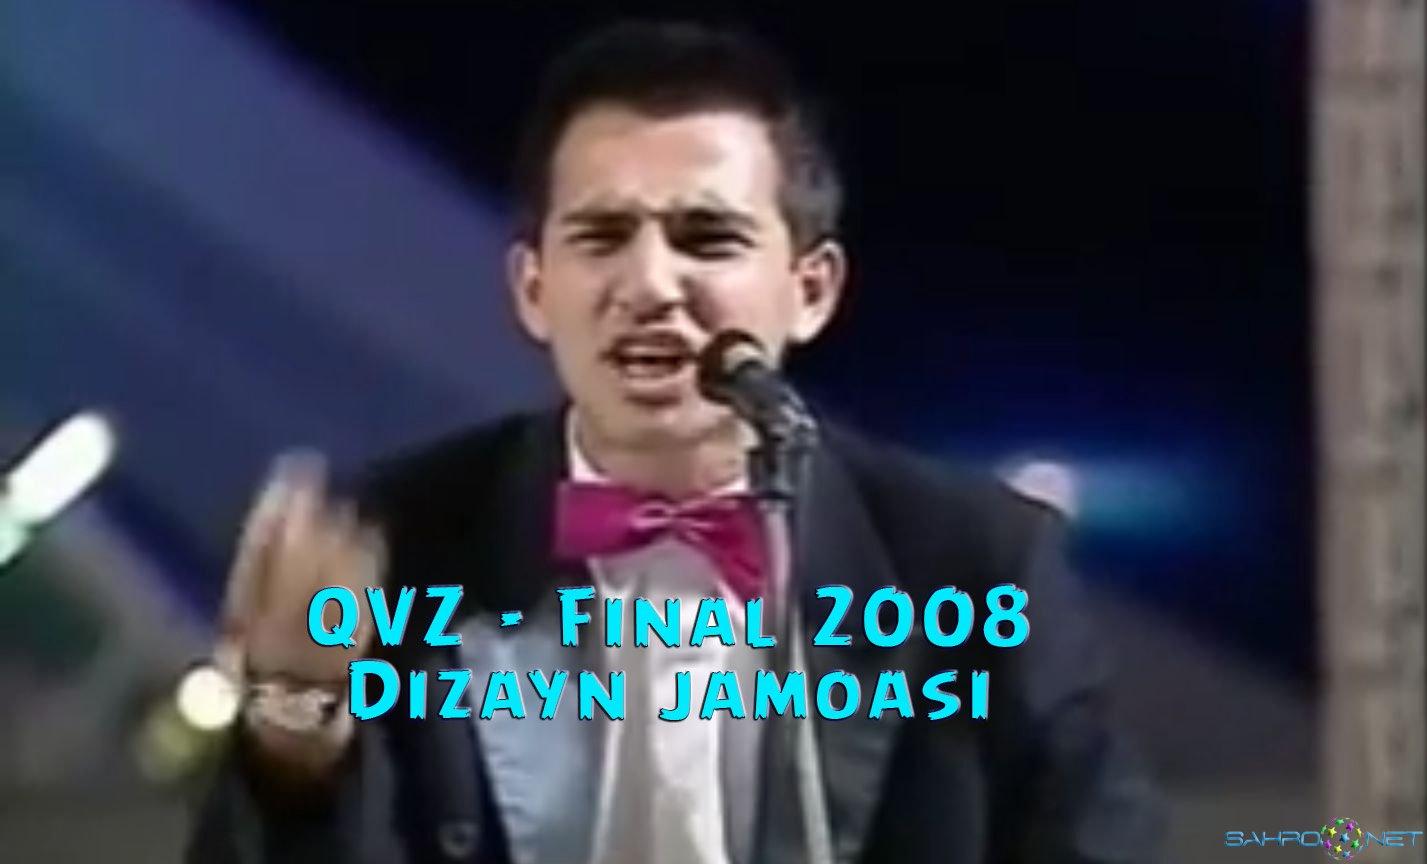 QVZ / КВЗ ФИНАЛ 2008